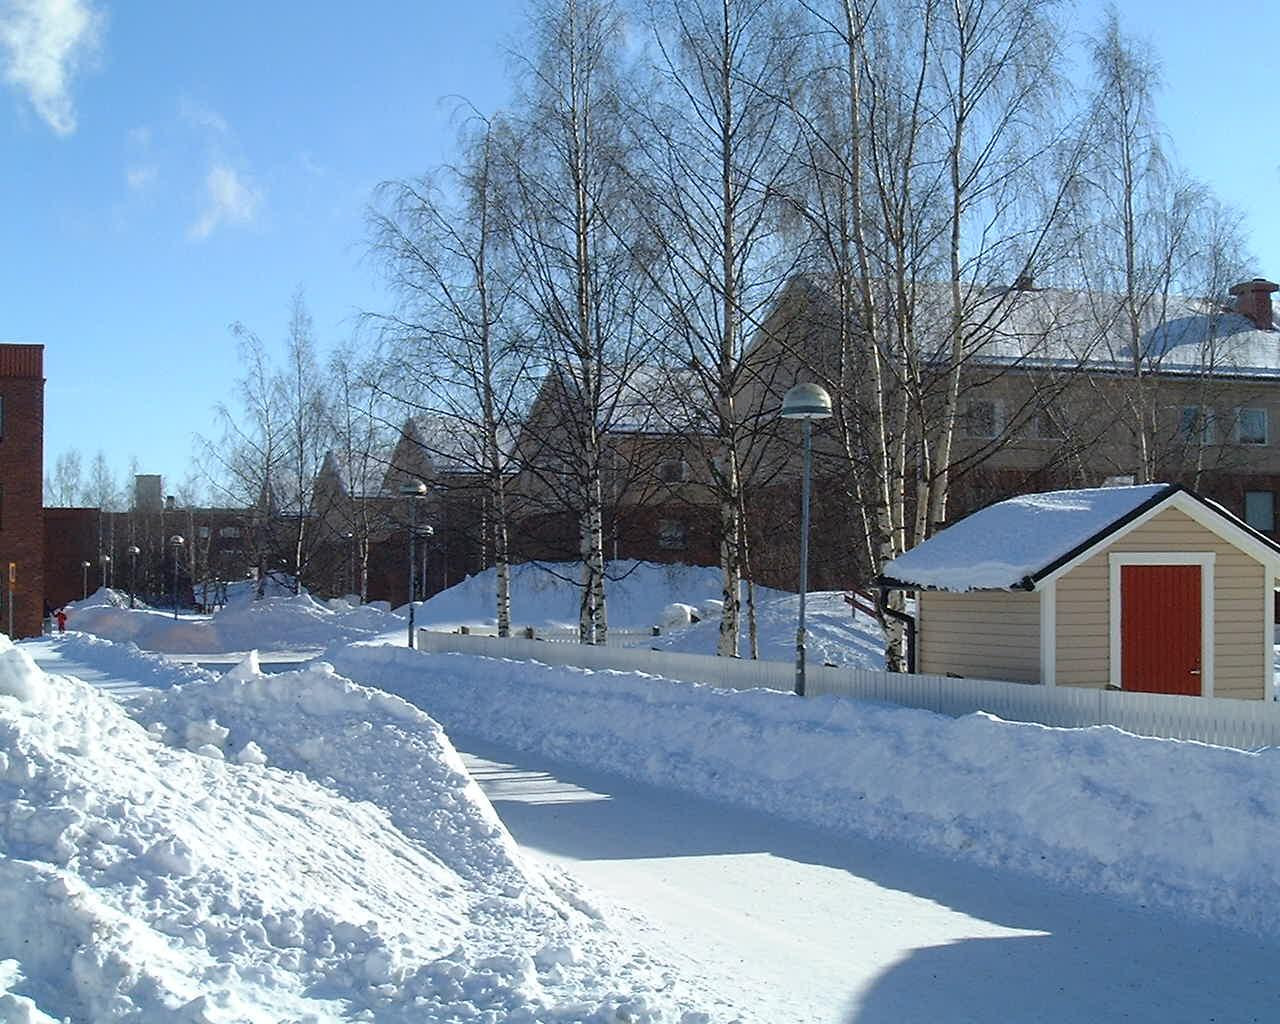 Properties for rent in Ume - lidhem, 4 rooms - Bostadsportal